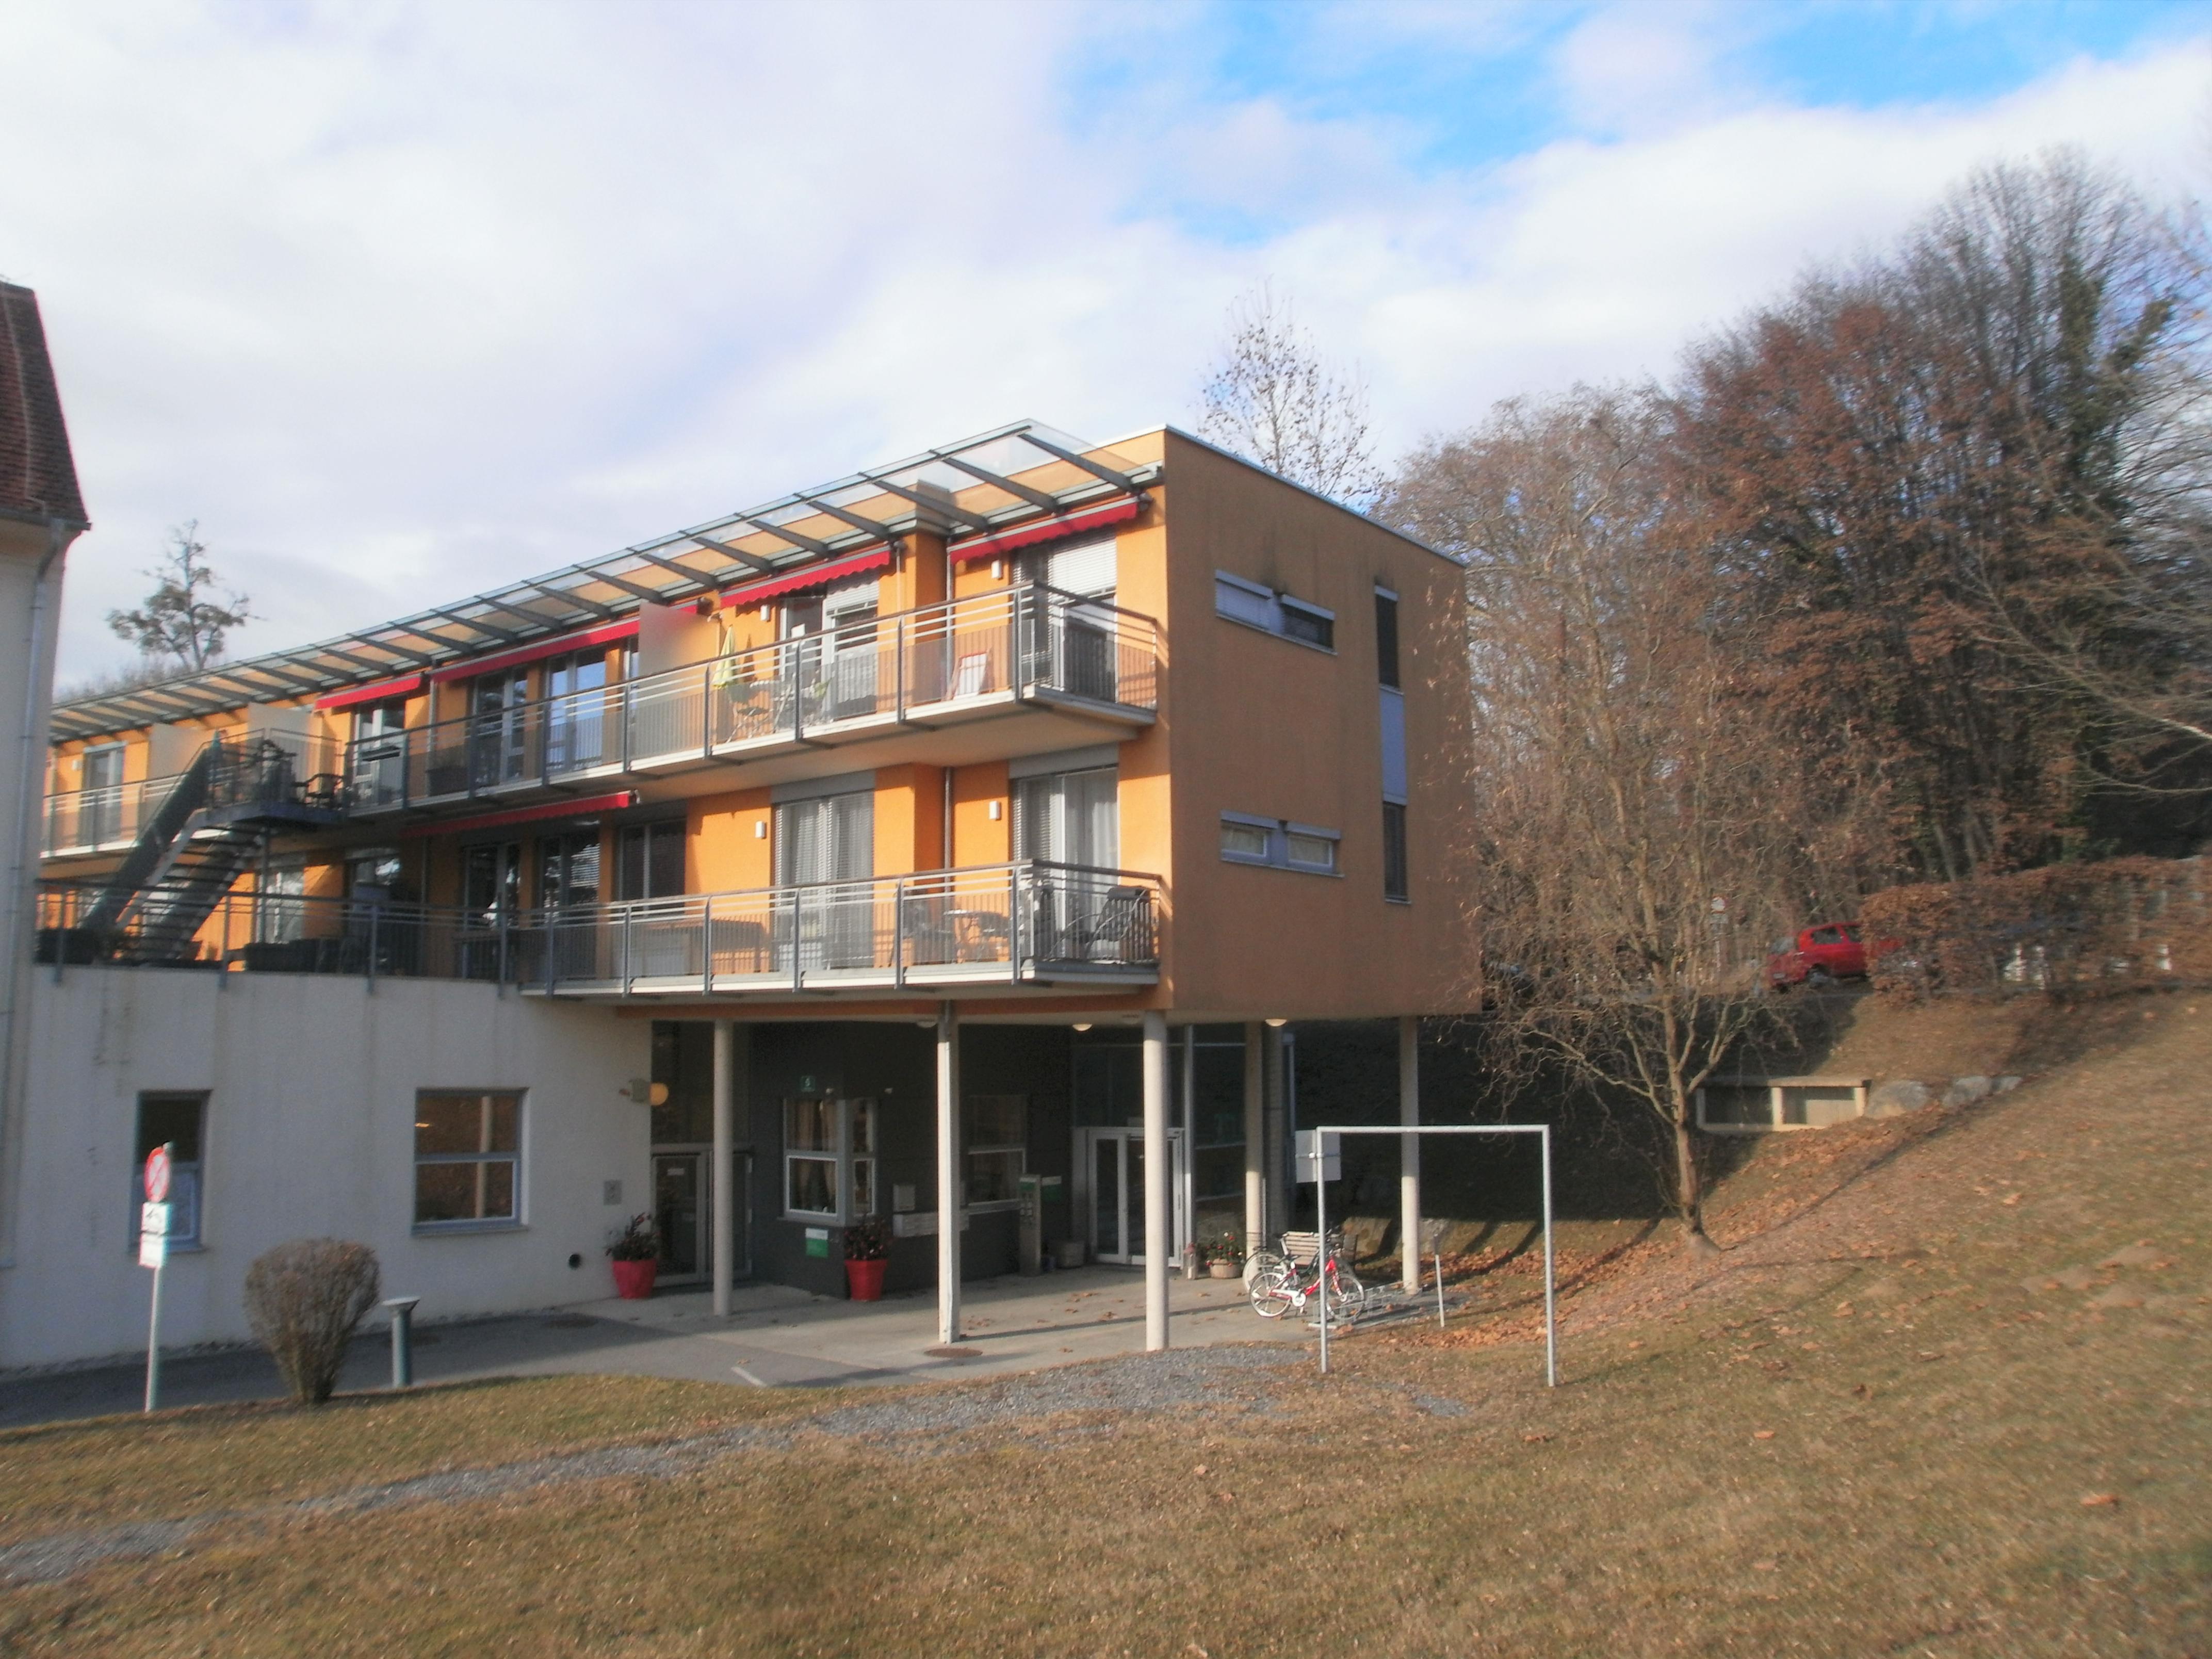 Lebenshilfen Soziale Dienste Wohnhaus am Rosenhain, Rosenhain 5, 8010, Austria